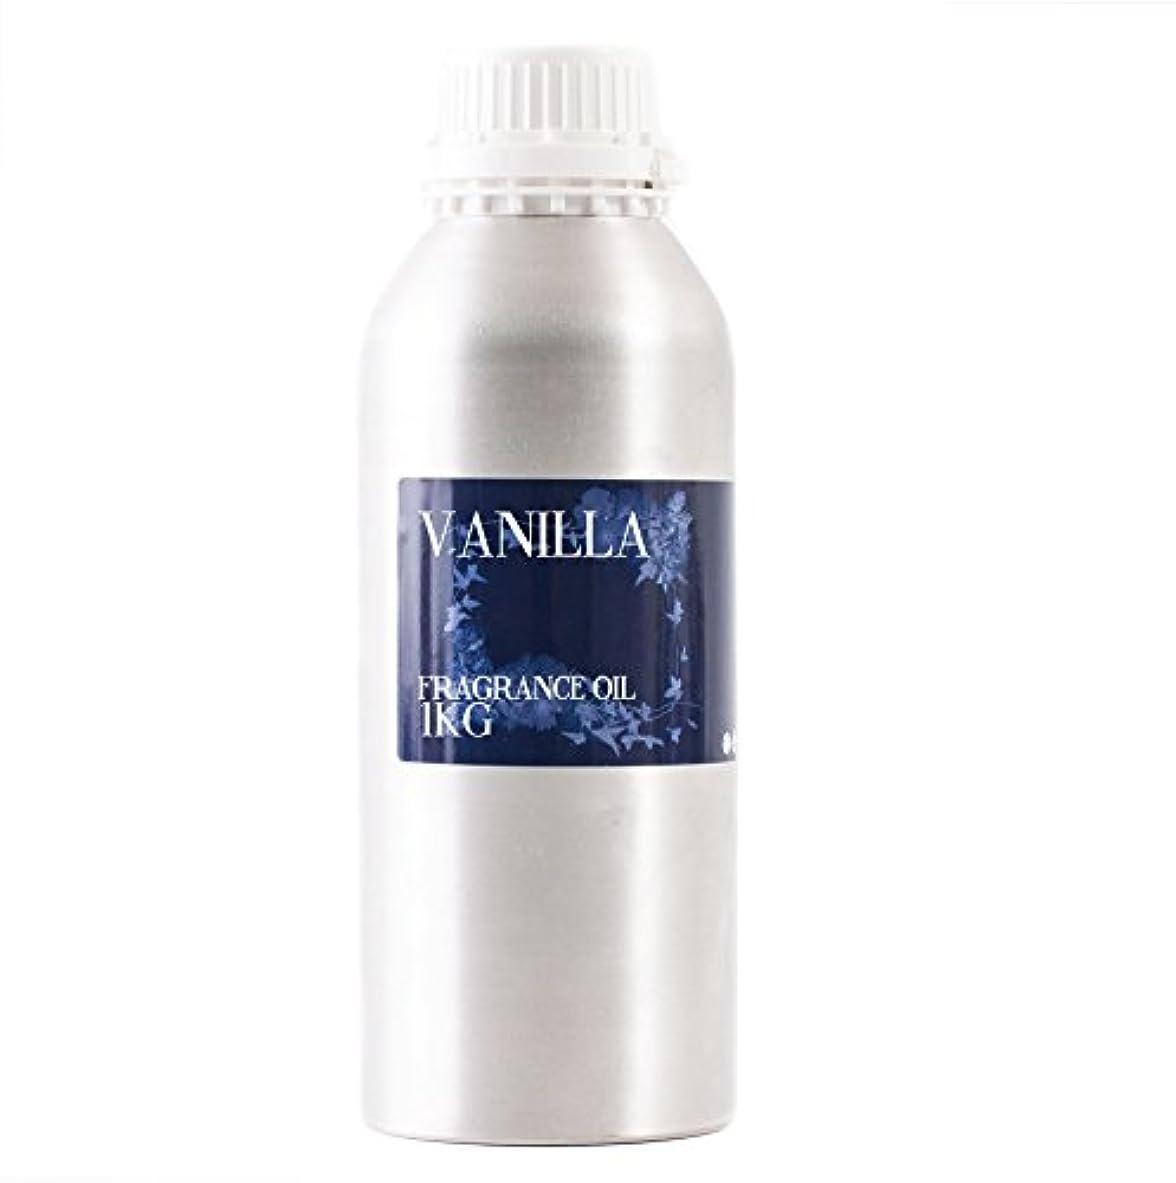 Mystic Moments | Vanilla Fragrance Oil - 1Kg